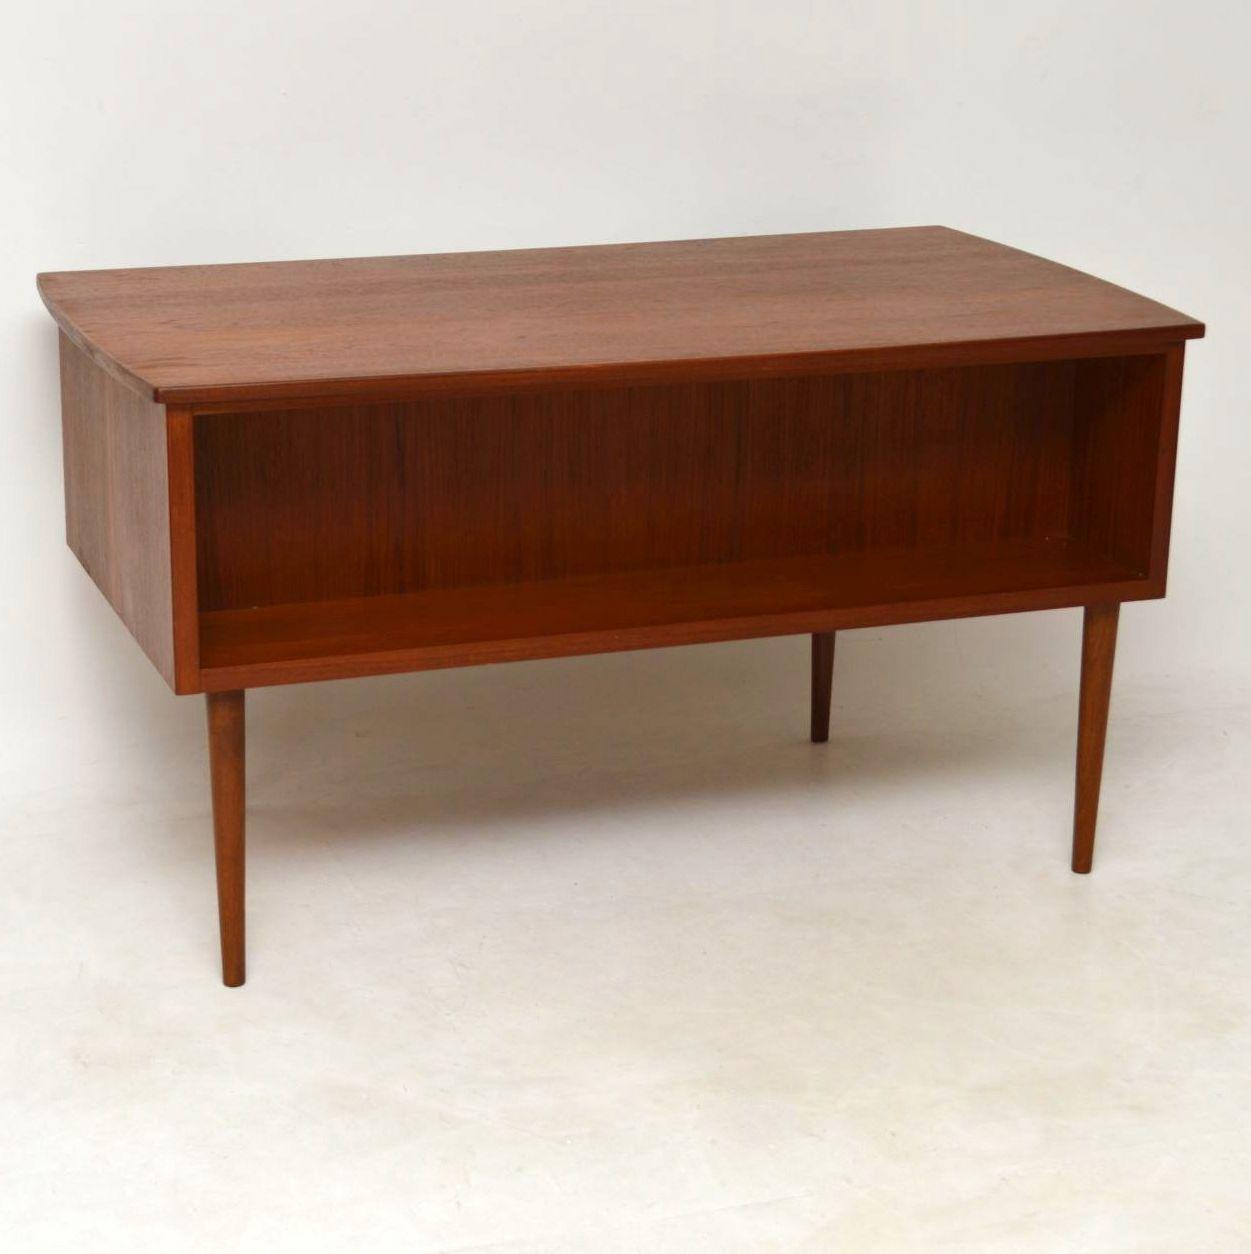 1960's Danish Vintage Teak Desk - 1960's Danish Vintage Teak Desk Interior Boutiques – Antiques For